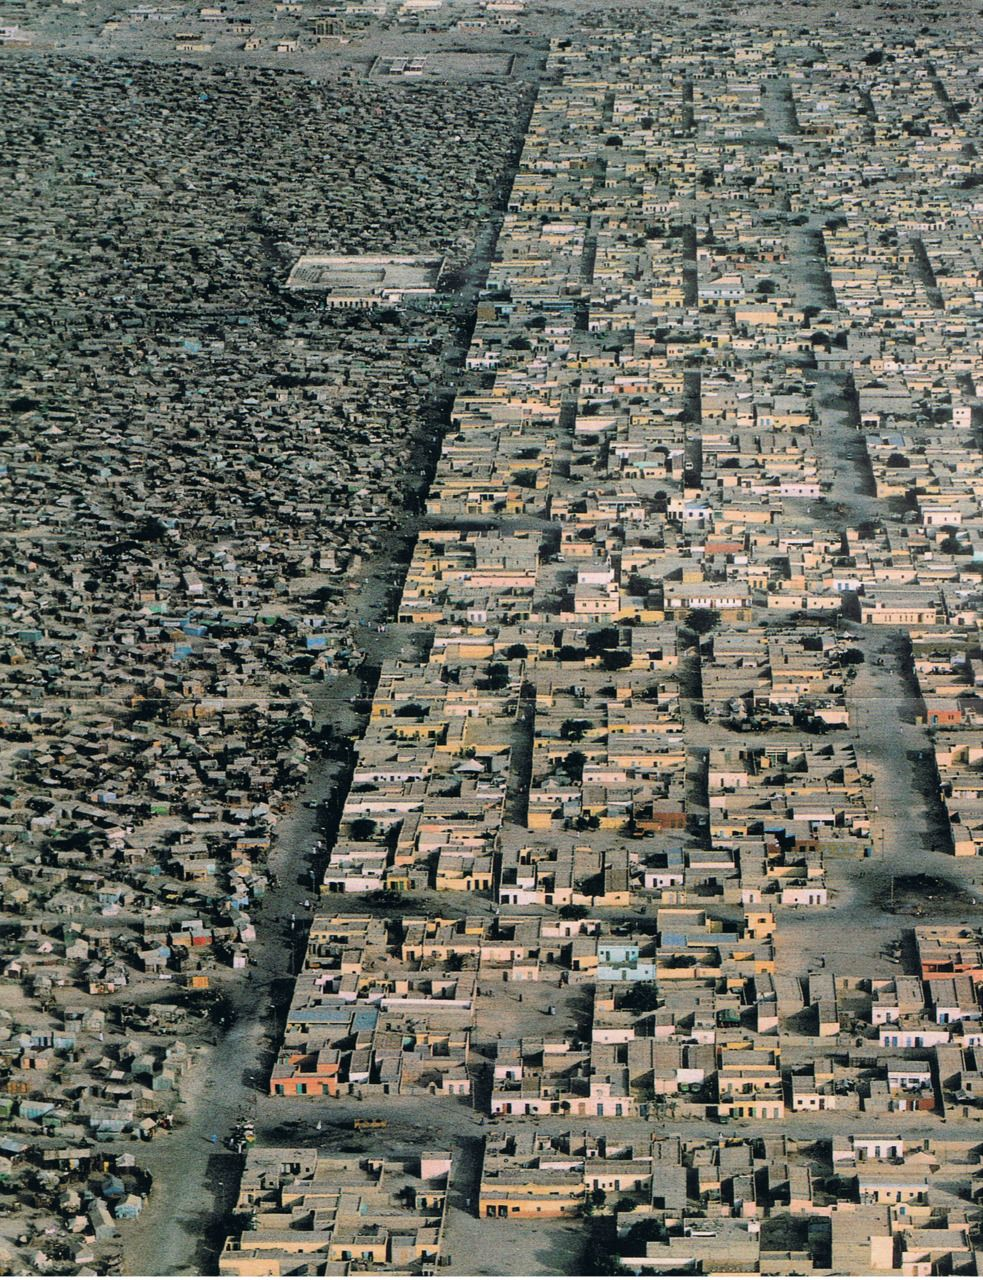 Nuakchot Mauritania Steve Mccurry Aerial Photography Nouakchott